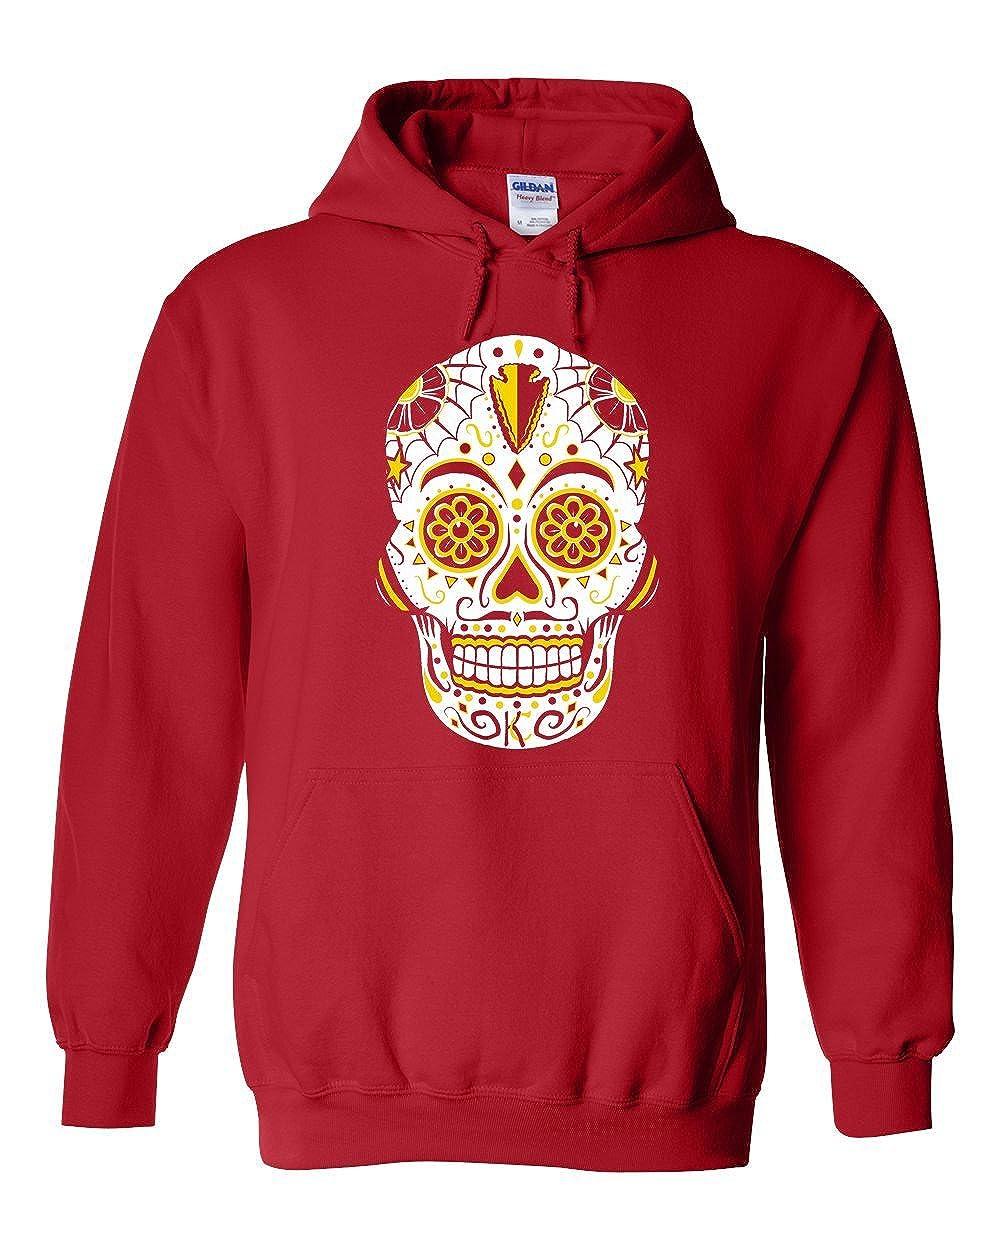 Americas Finest Apparel Kansas City Sugar Skull Hoodie